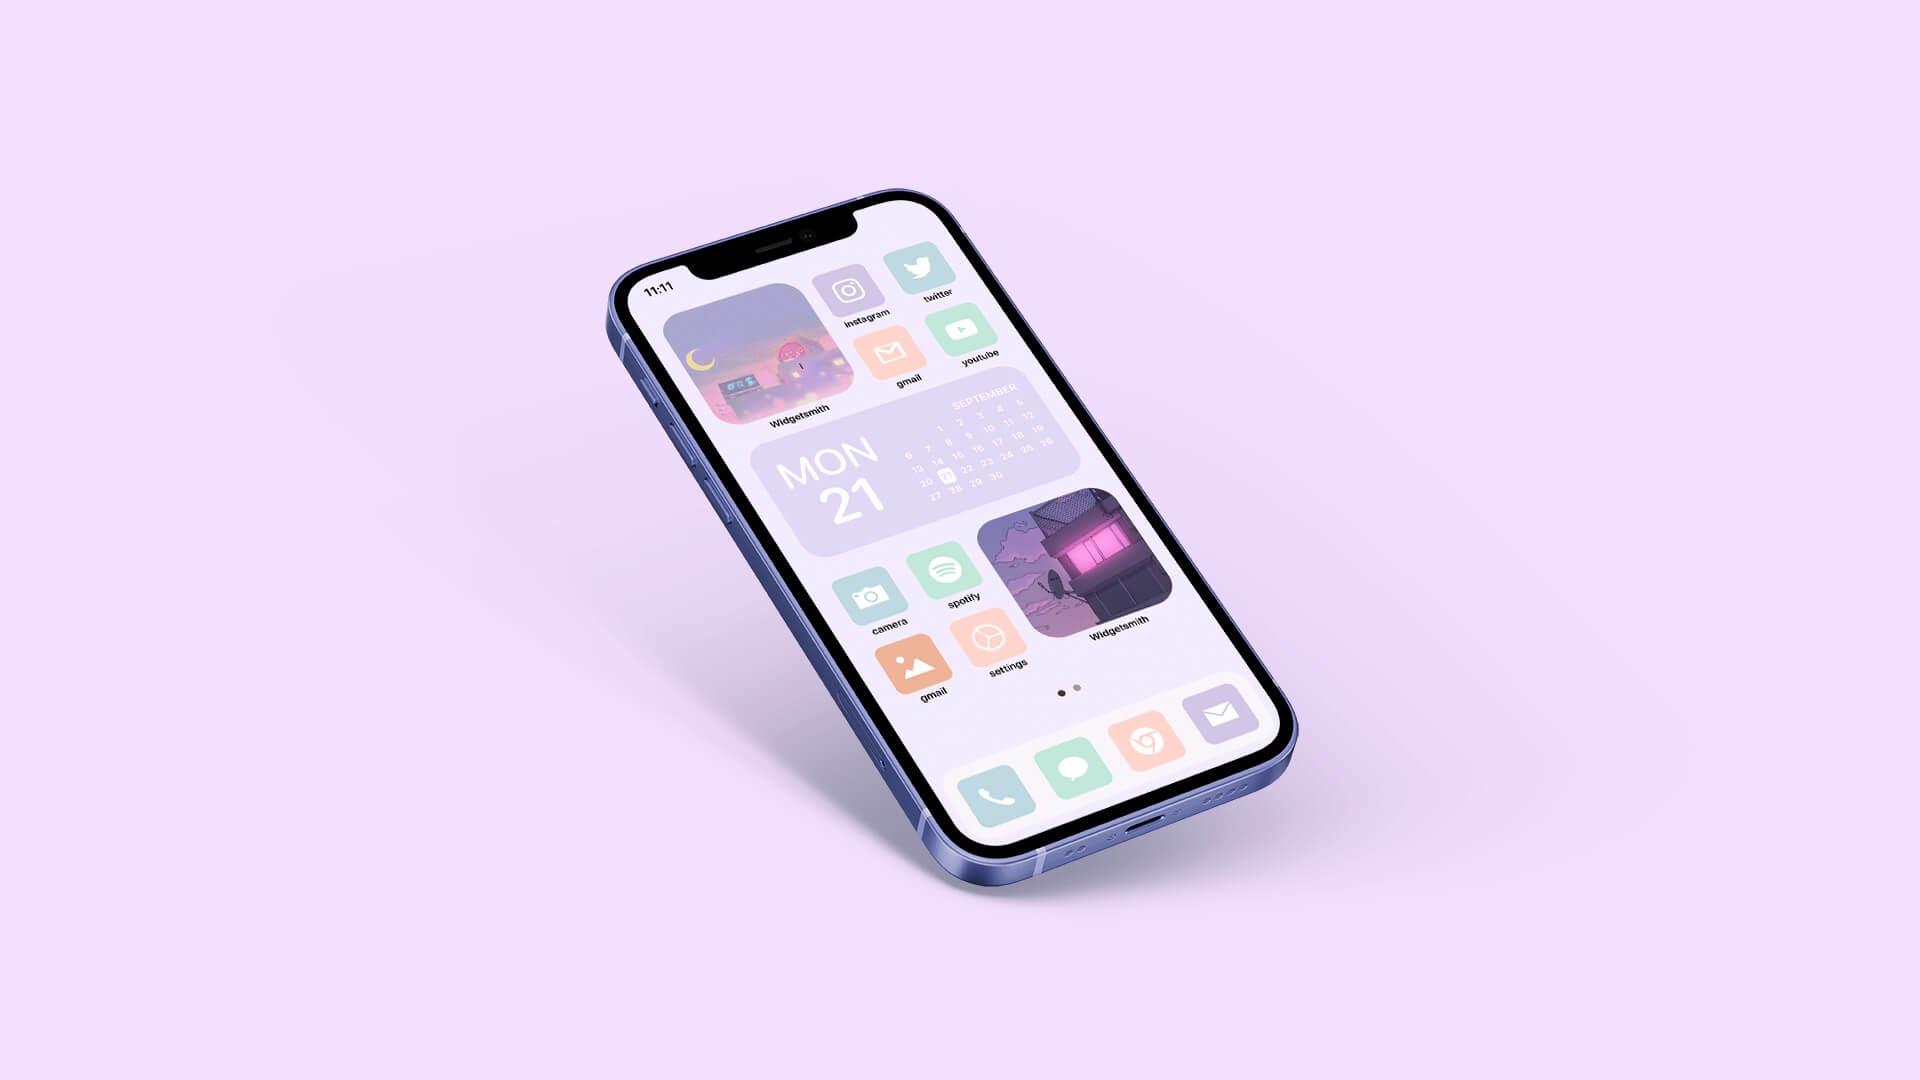 Minimal Aesthetic iOS Home Screen Theme Ideas